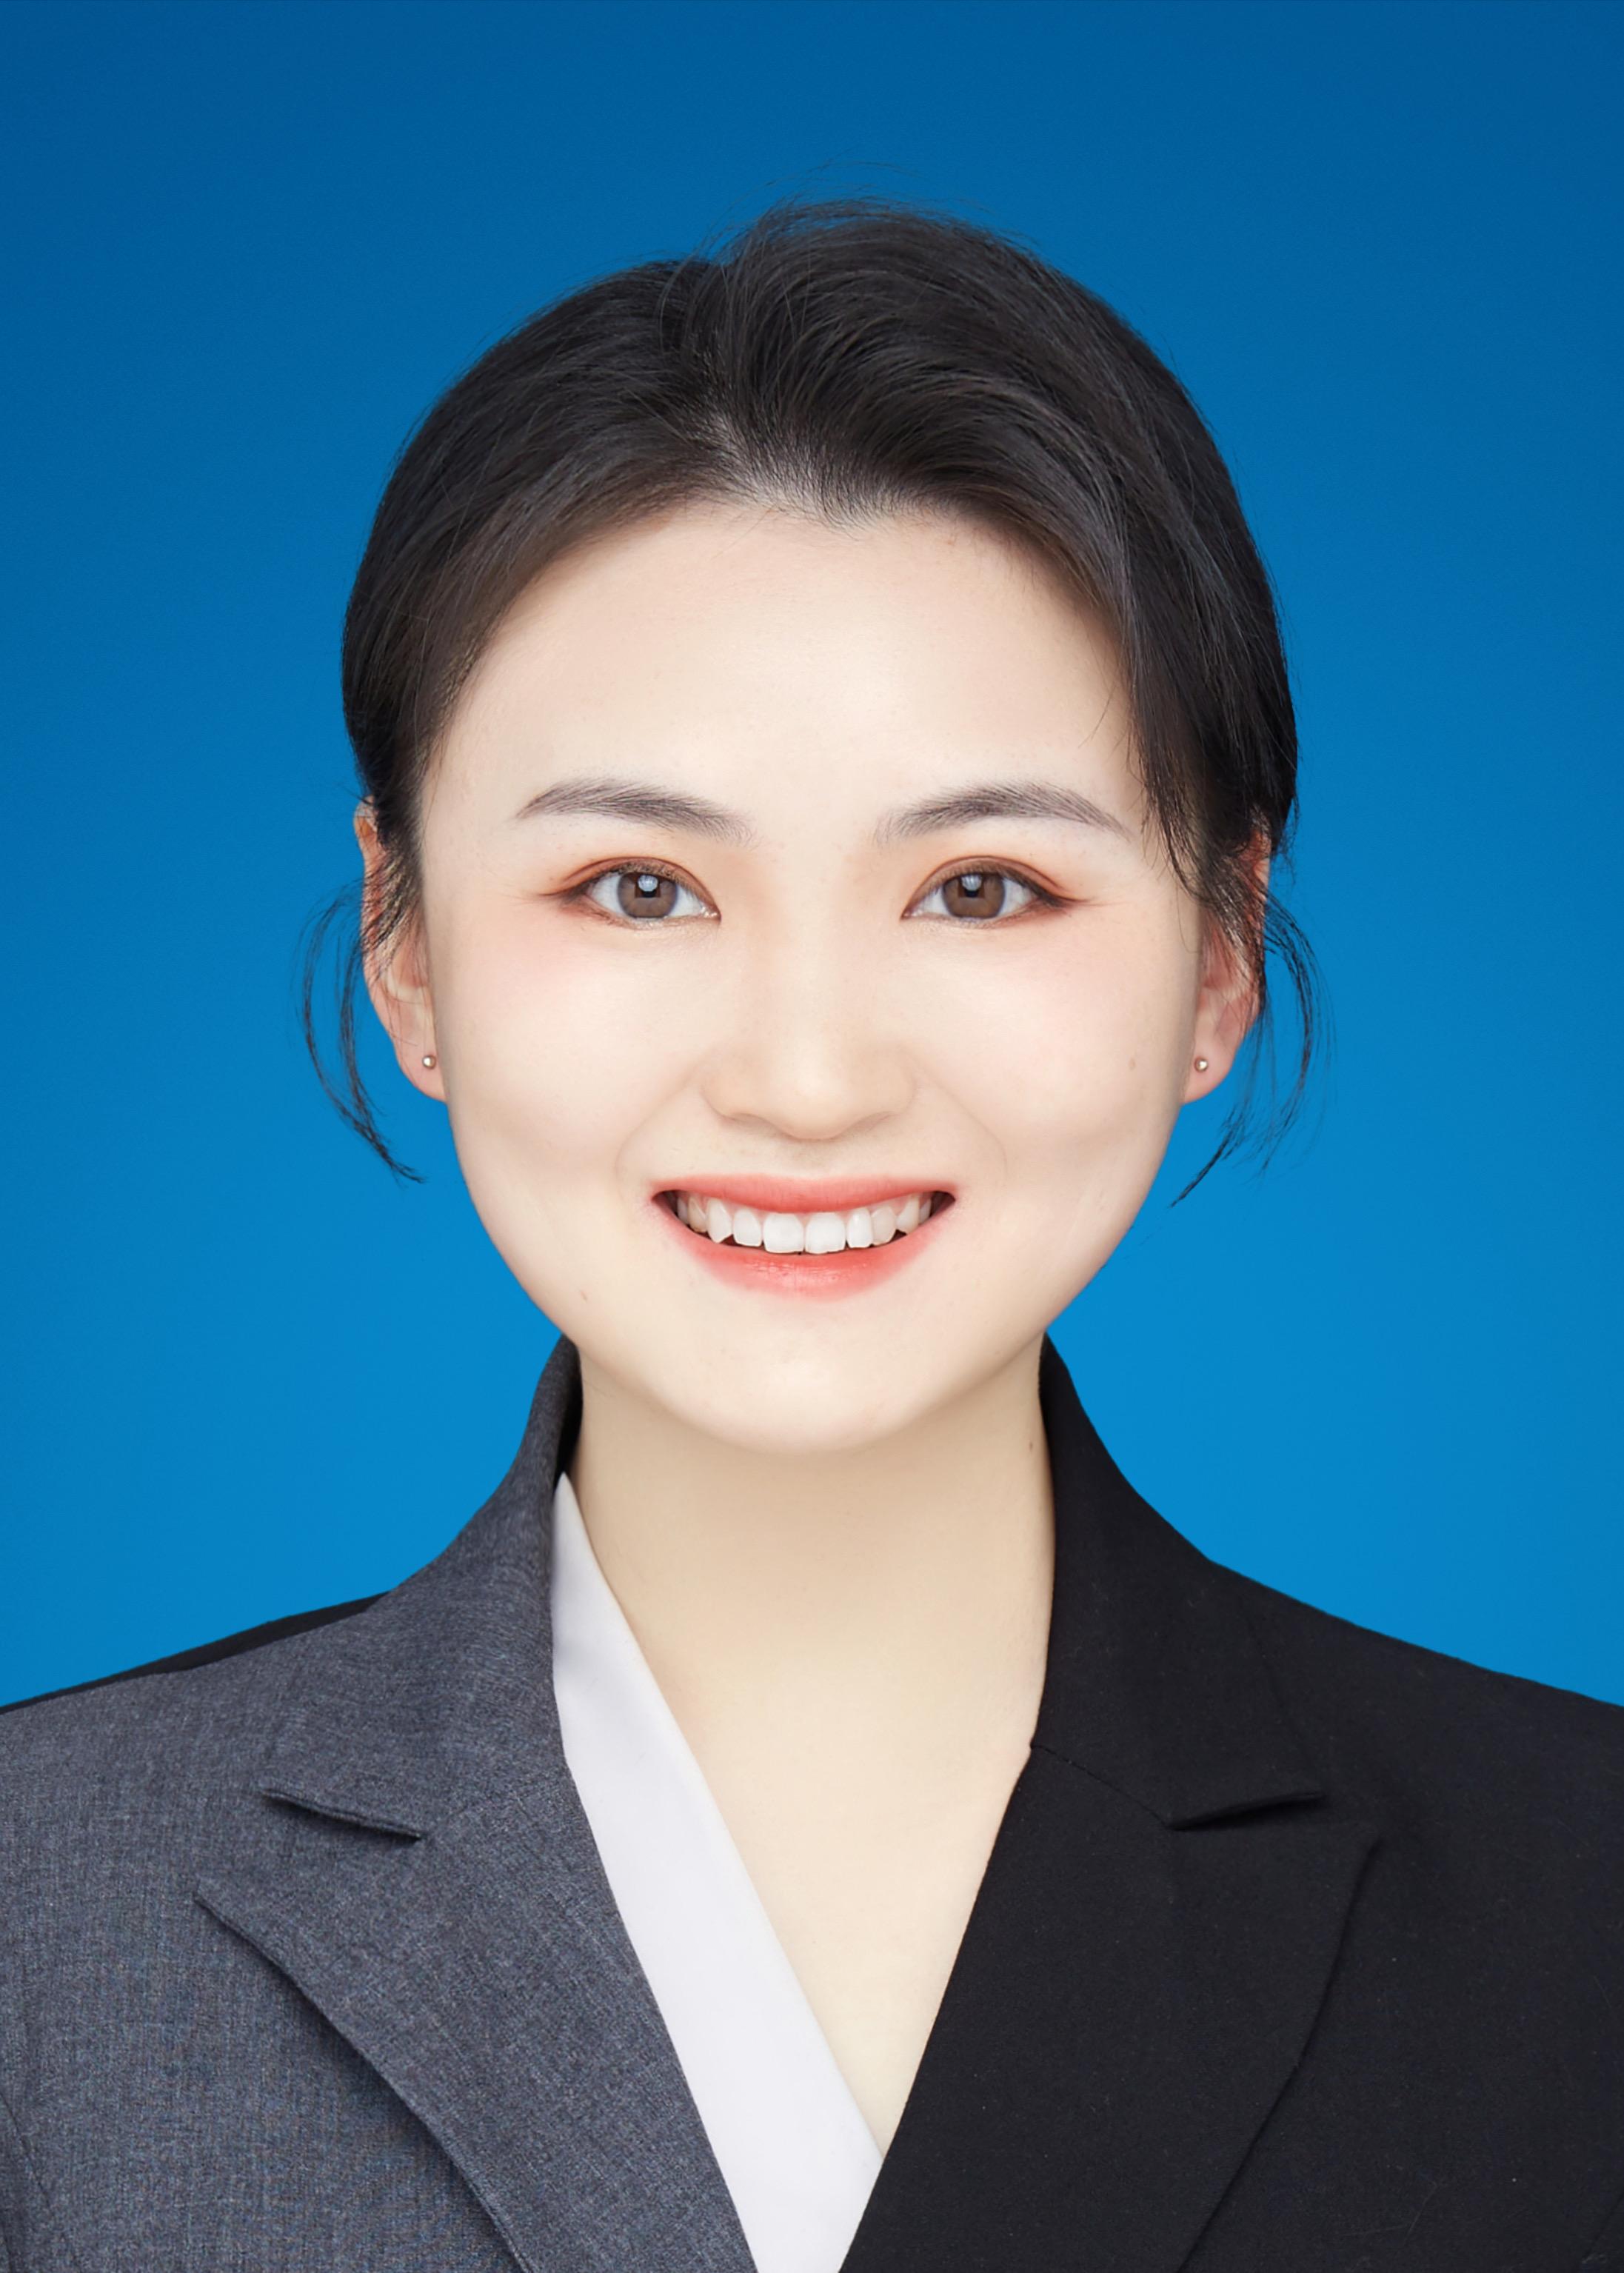 杨晓-证件照